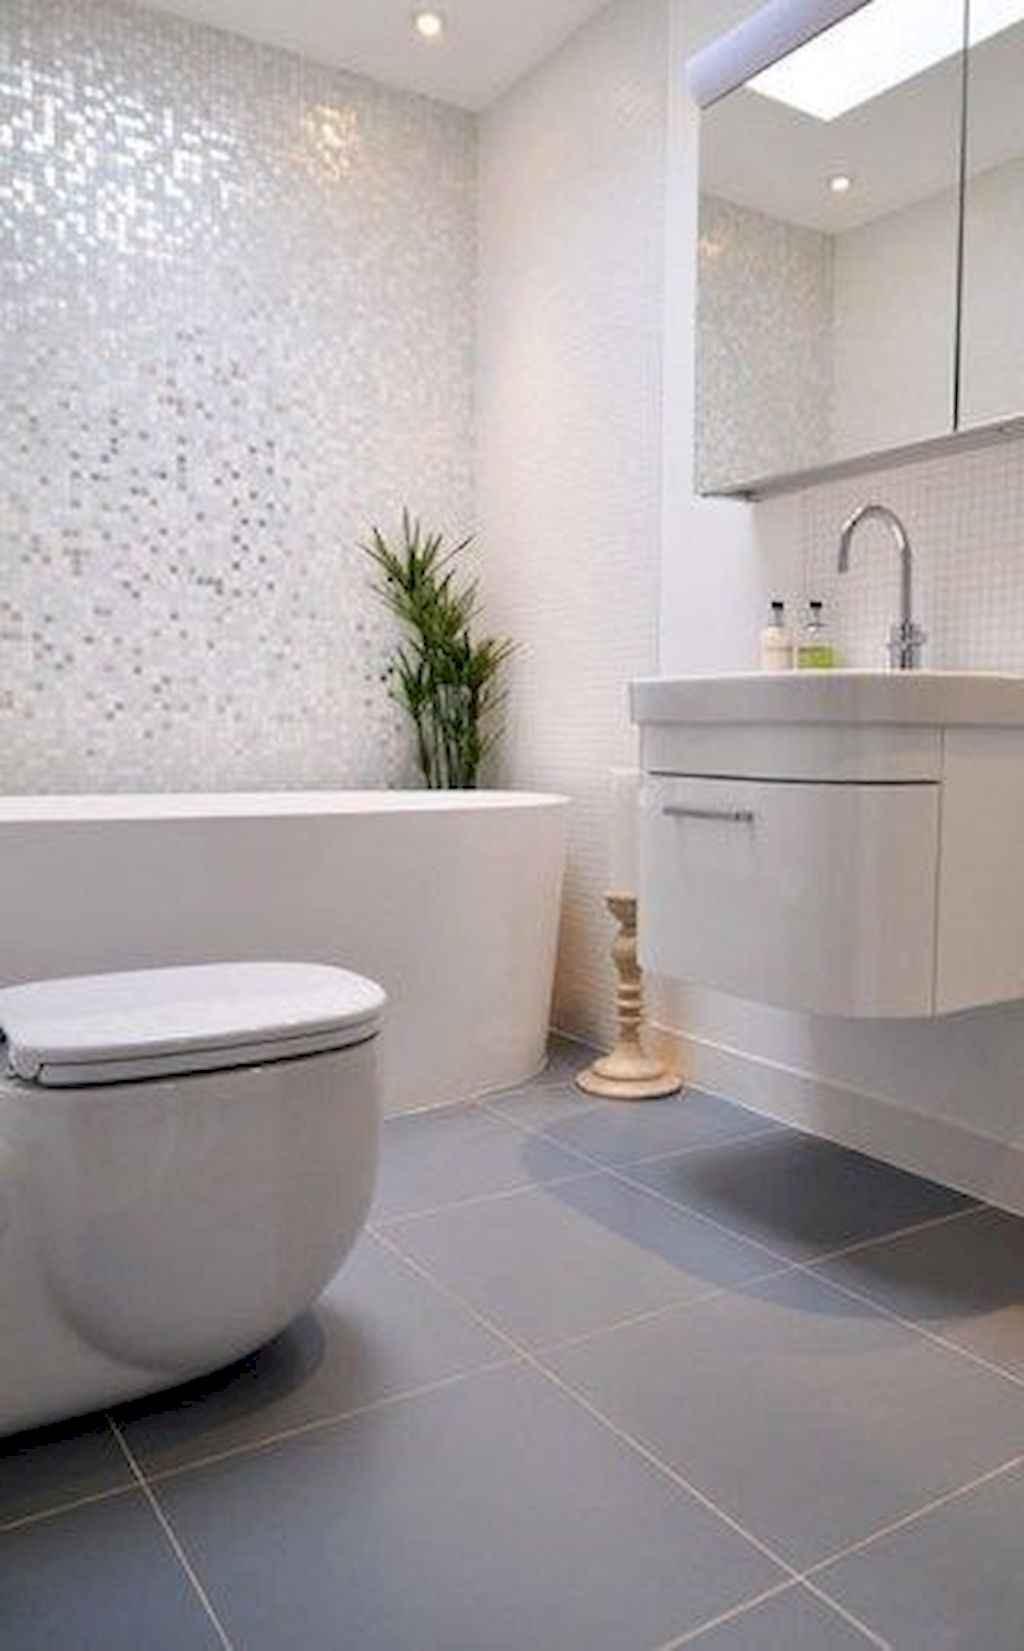 111 Brilliant Small Bathroom Remodel Ideas On A Budget (68)